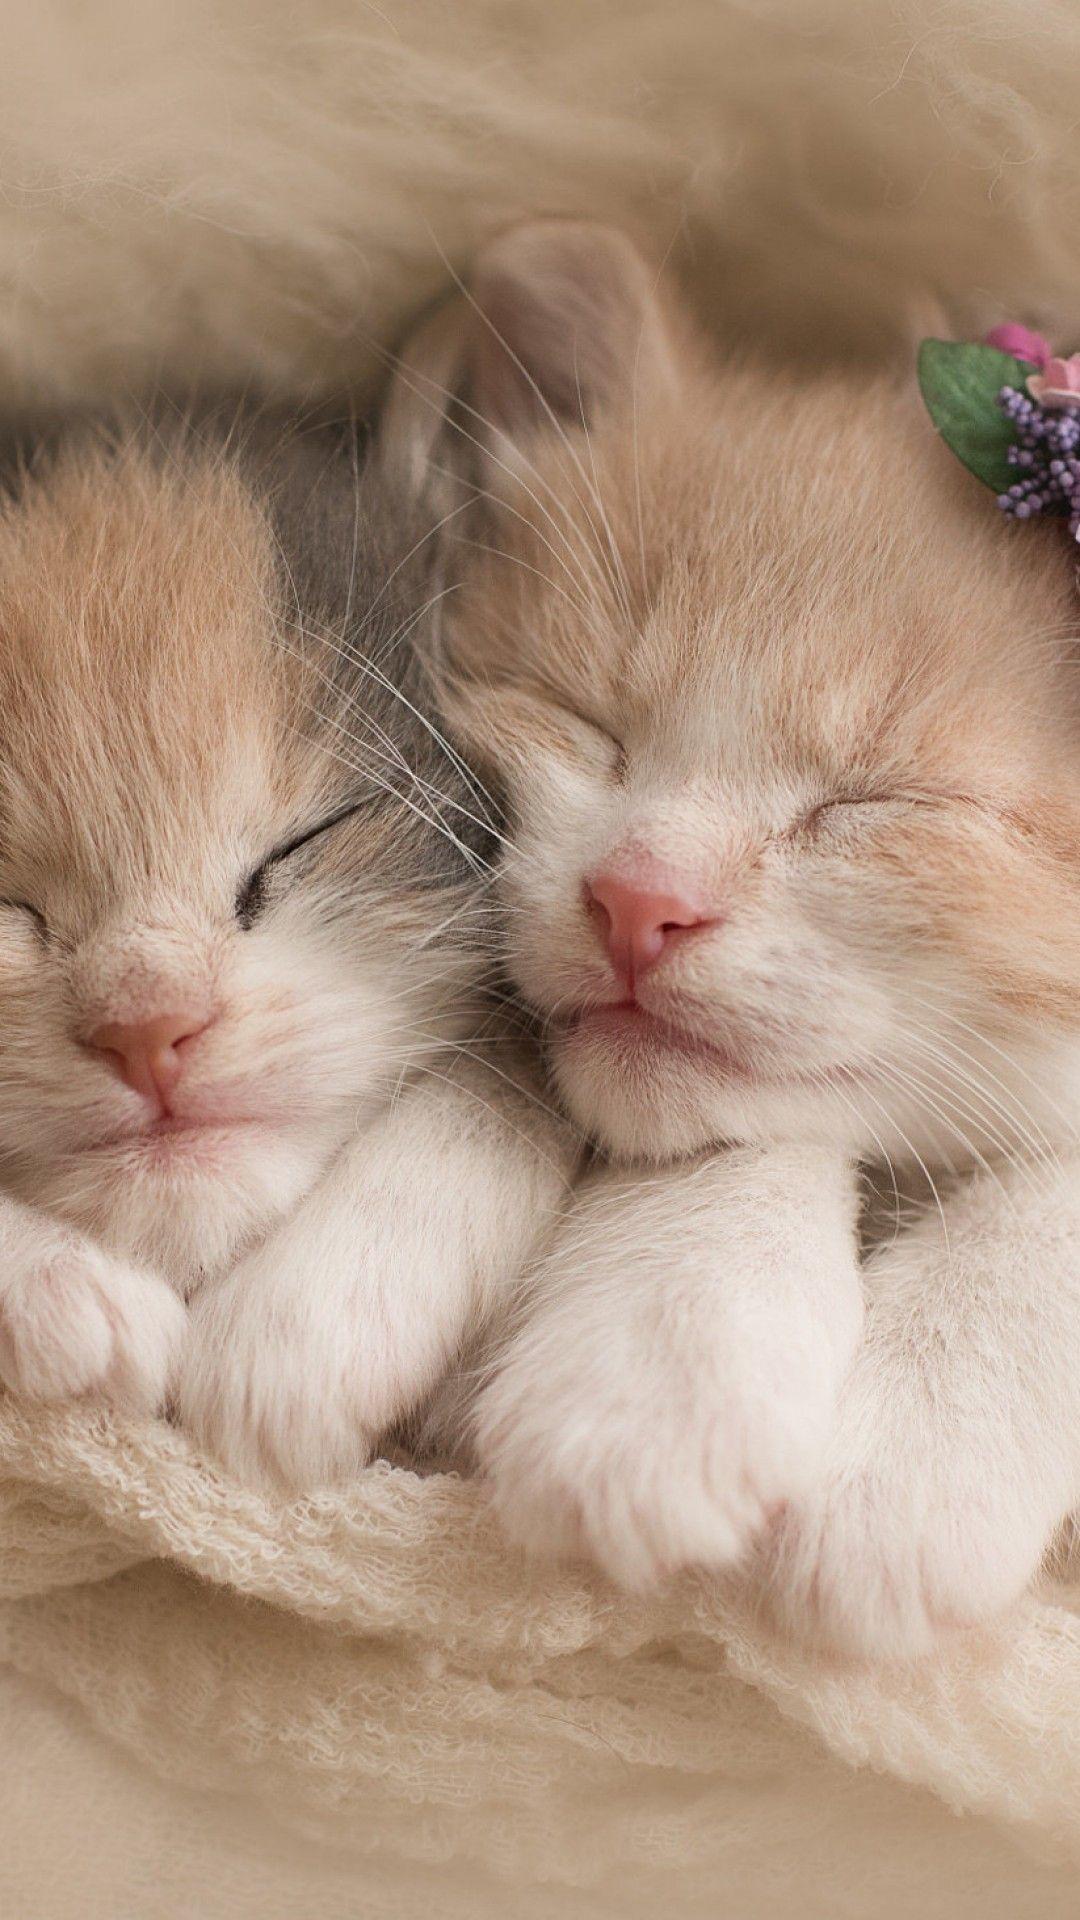 Kitten Cat Iphone Background In 2020 Kitten Wallpaper Cats And Kittens Iphone Background